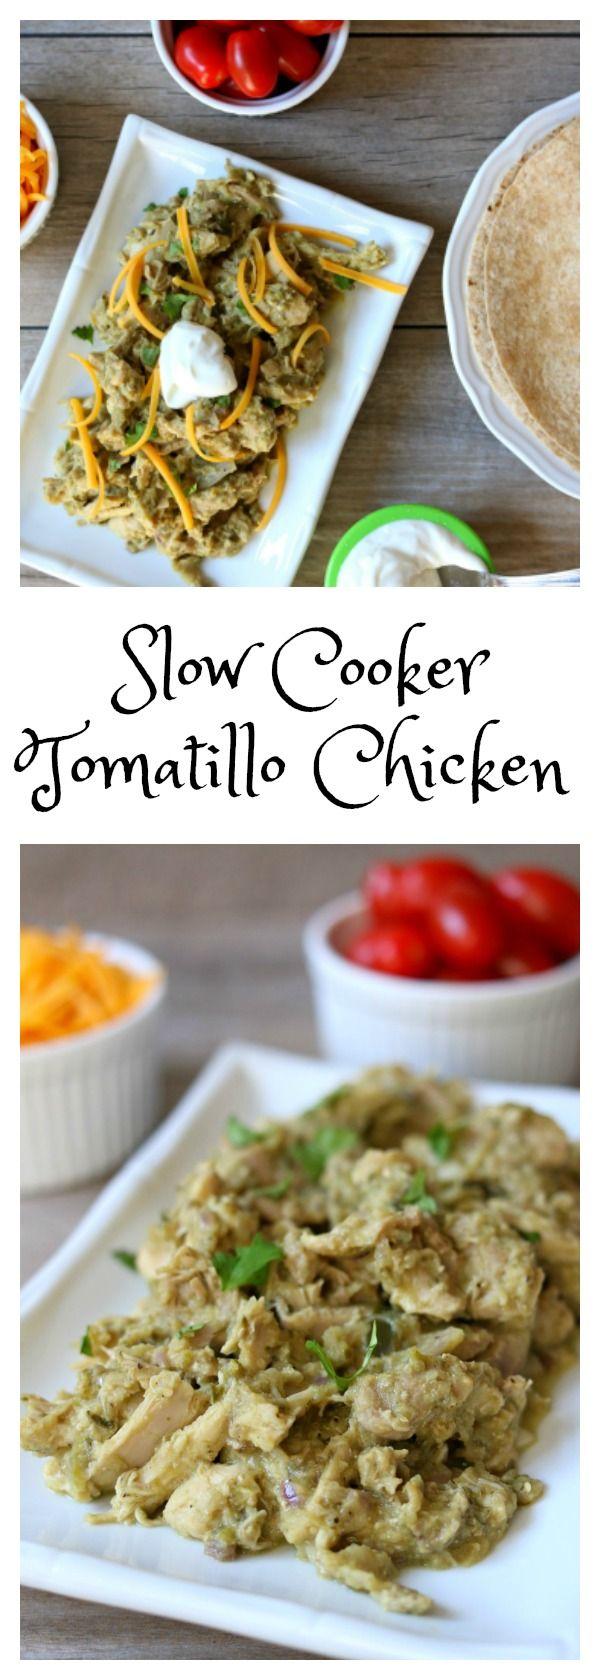 Slow Cooker Tomatillo Chicken Filling